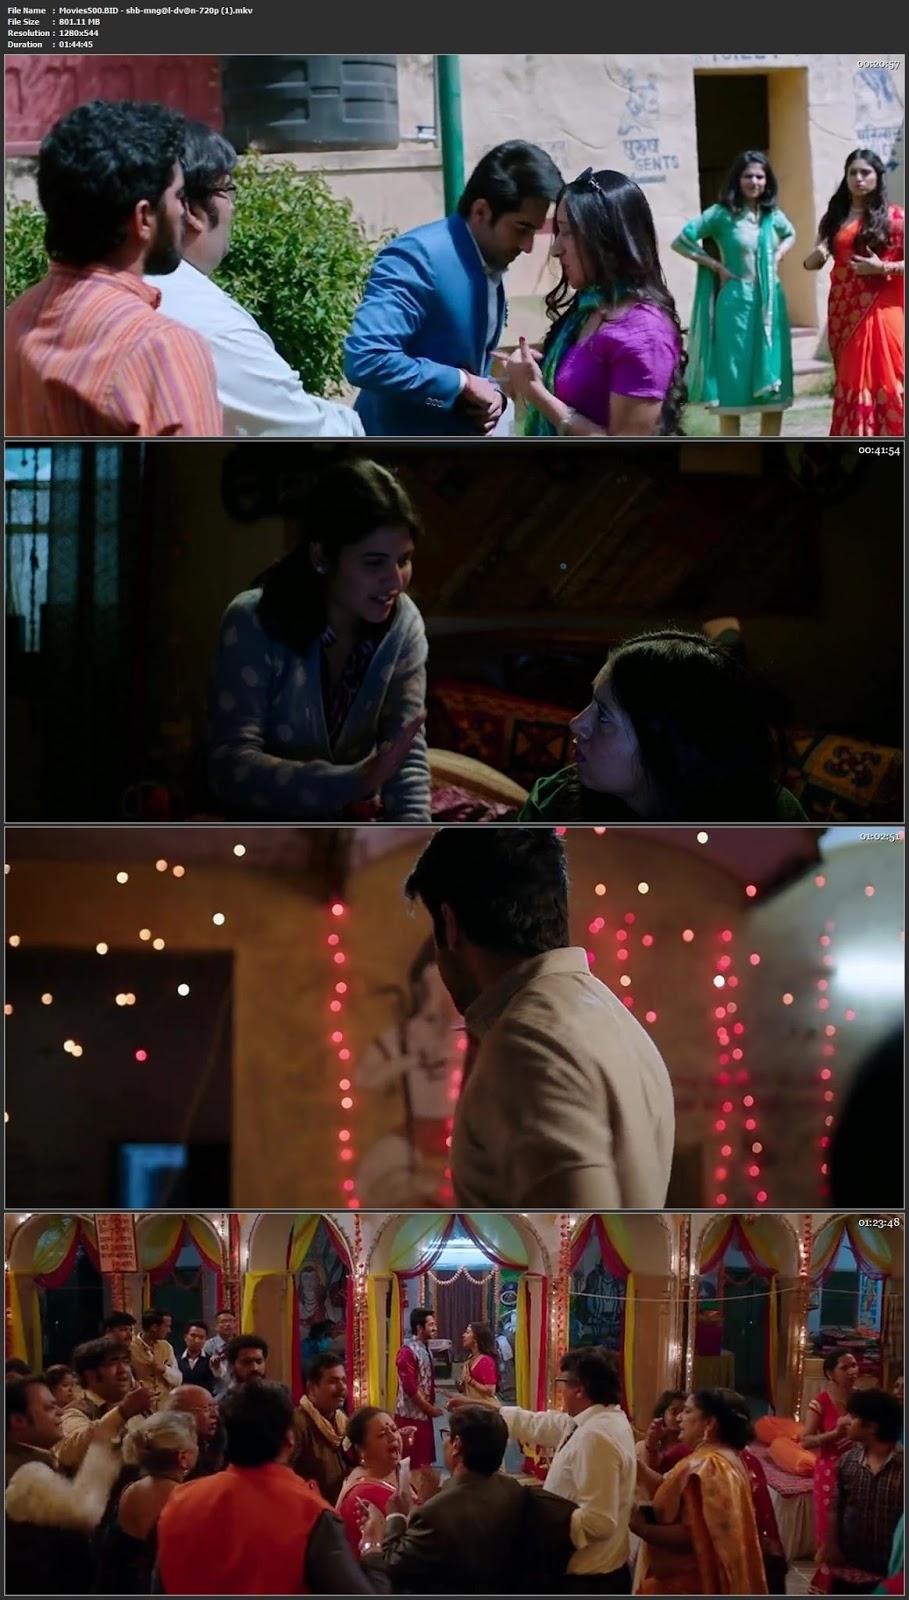 Shubh Mangal Saavdhan 2017 Hindi Full Movie DVDRip 720p at movies500.site